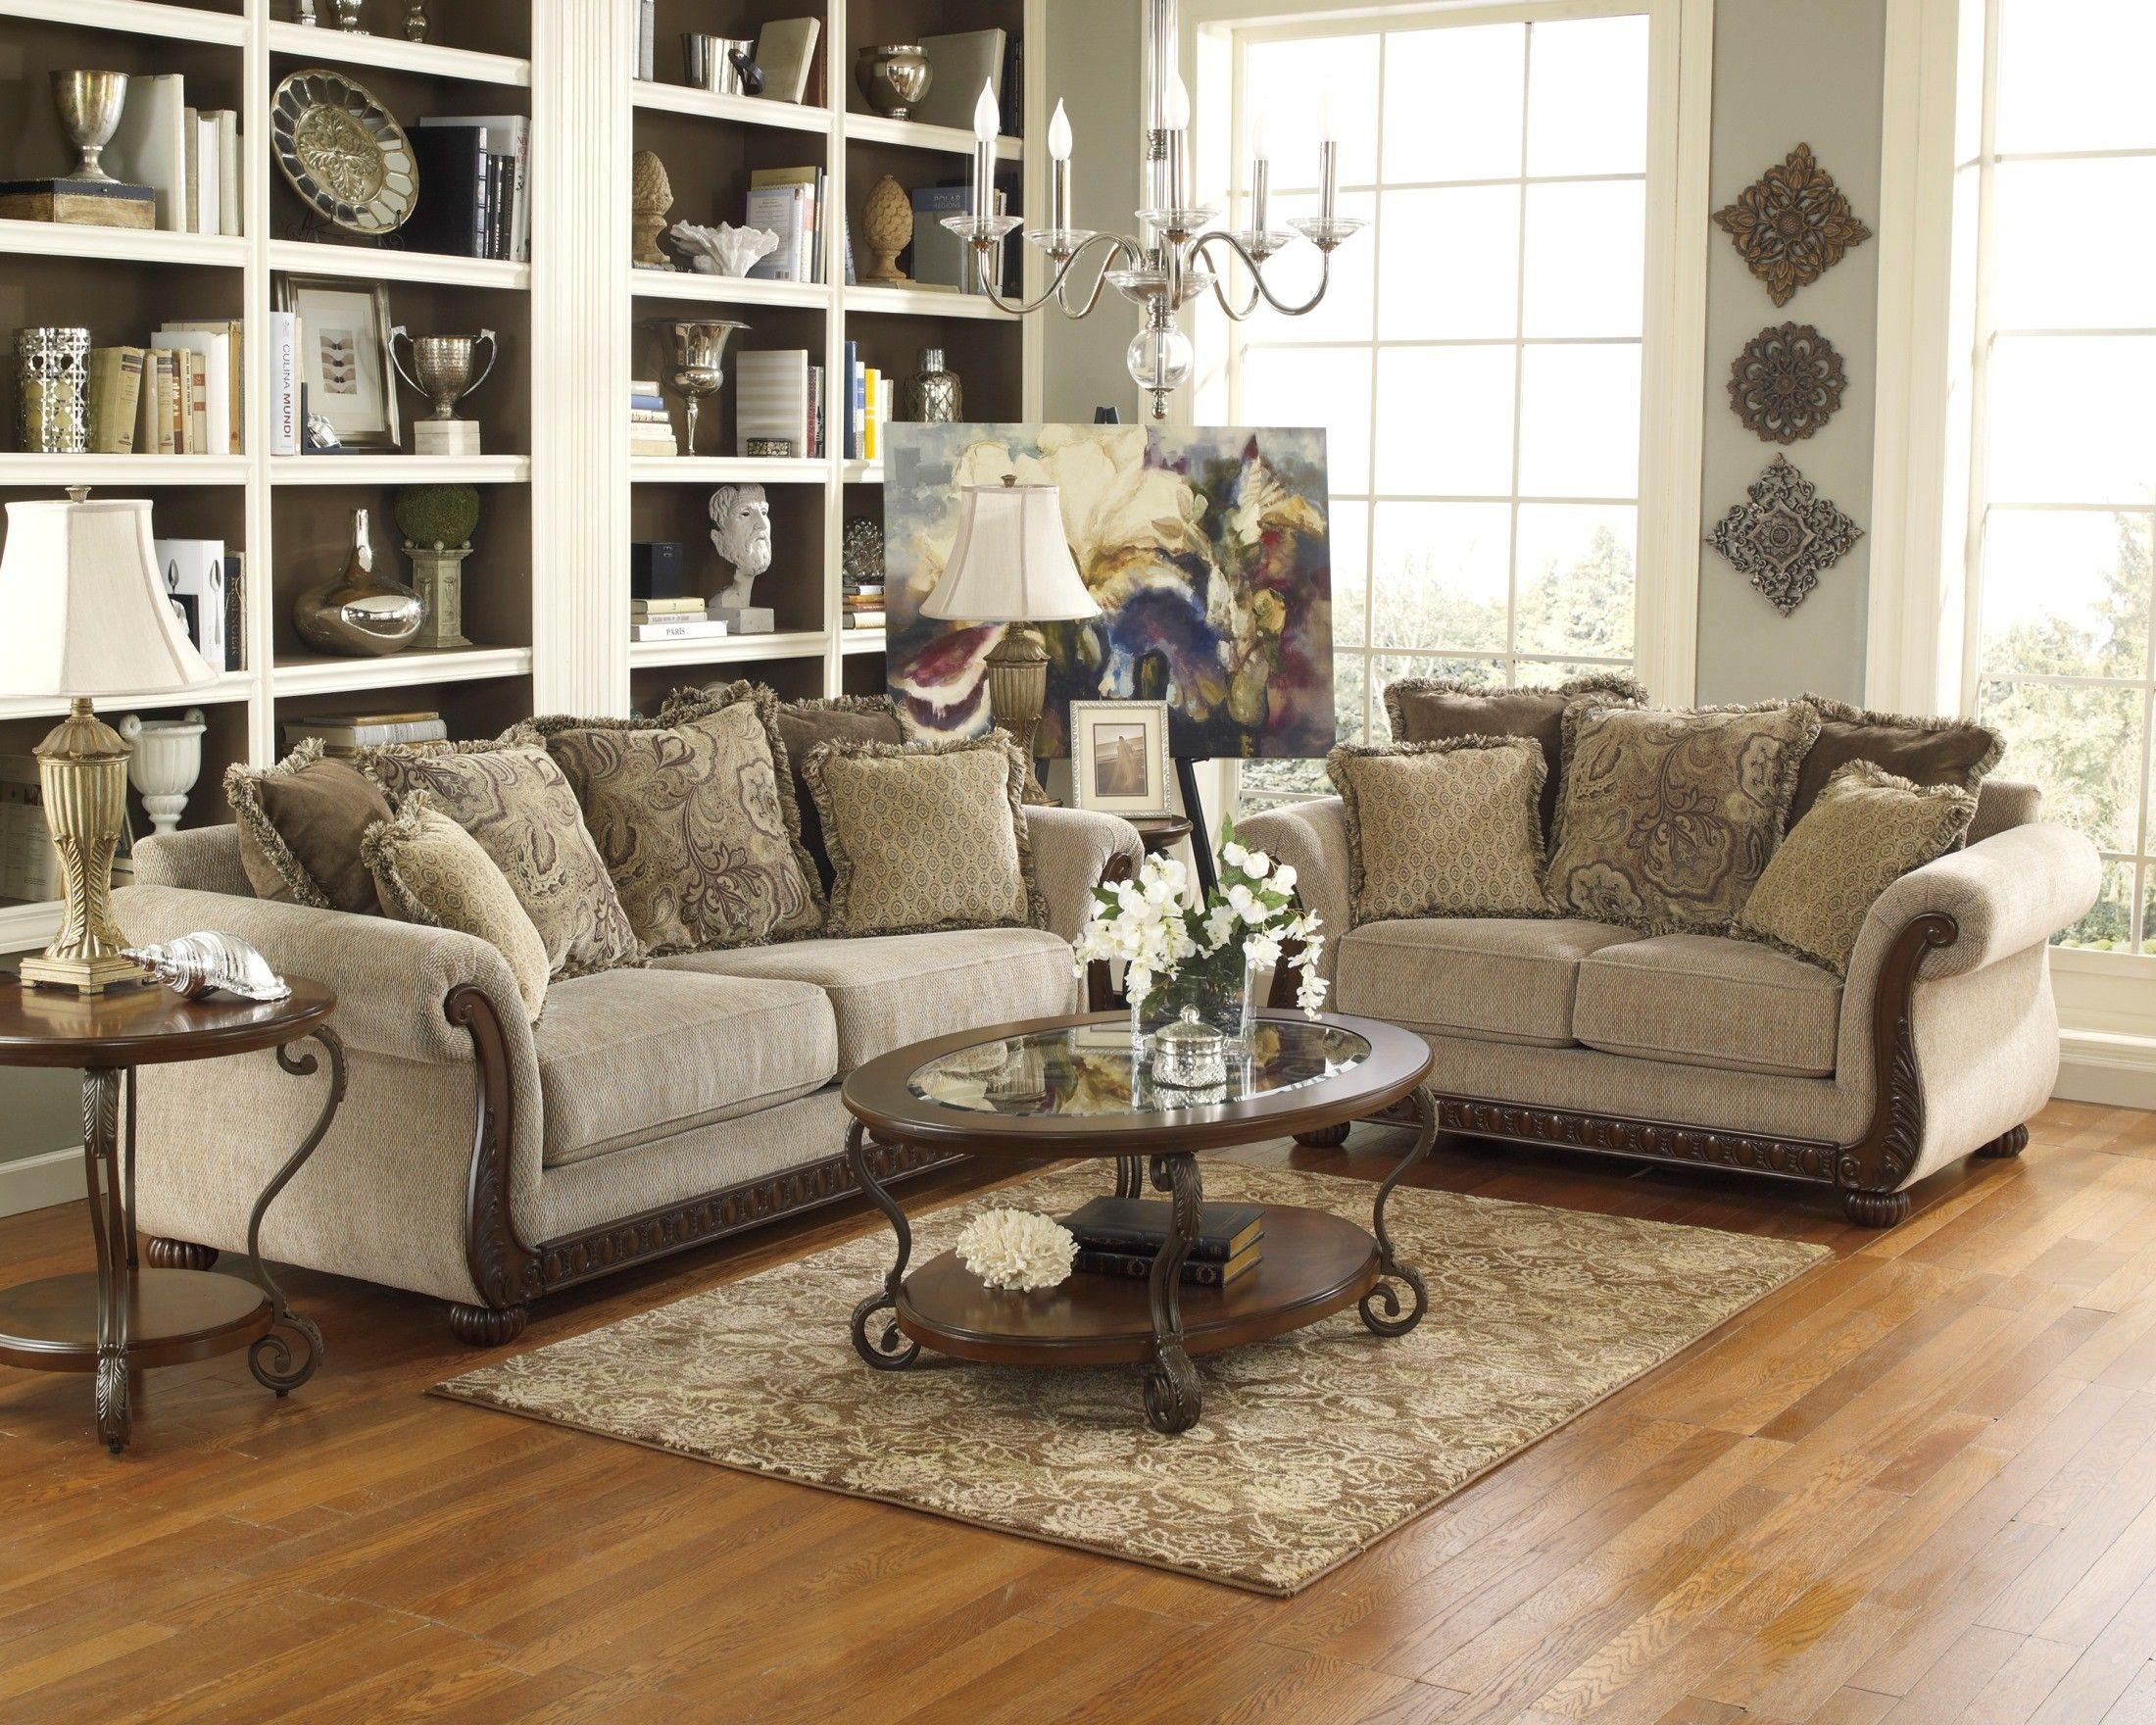 gracie-anne sofa | gracie-anne barley sofa, 8420138, ashley